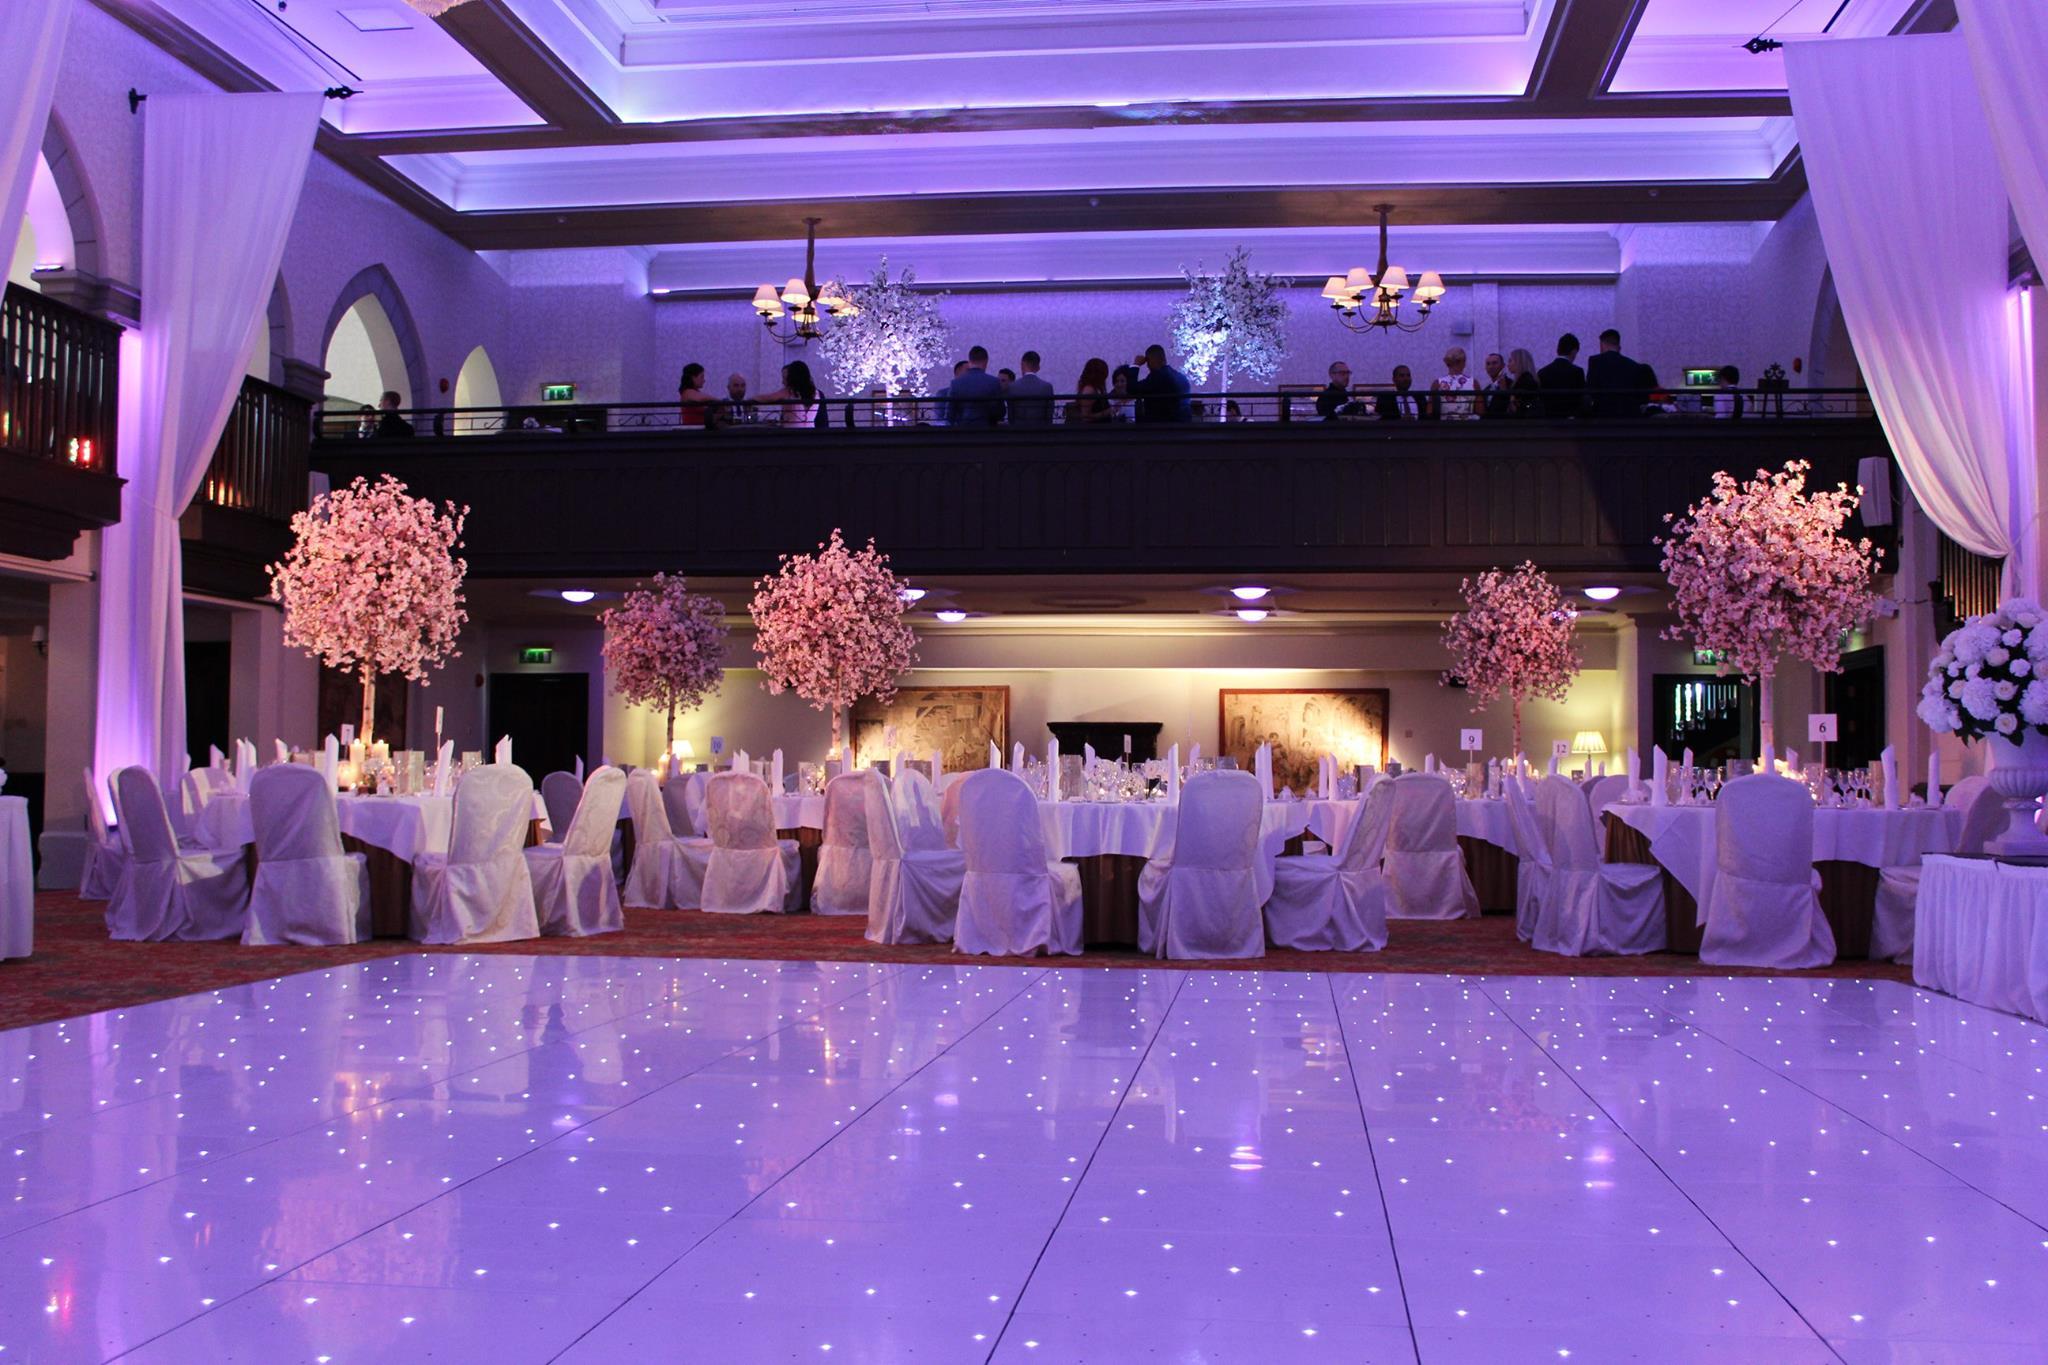 New wedding reception decorations lavender wedding castle wedding theme wedding decoration ideas junglespirit Gallery